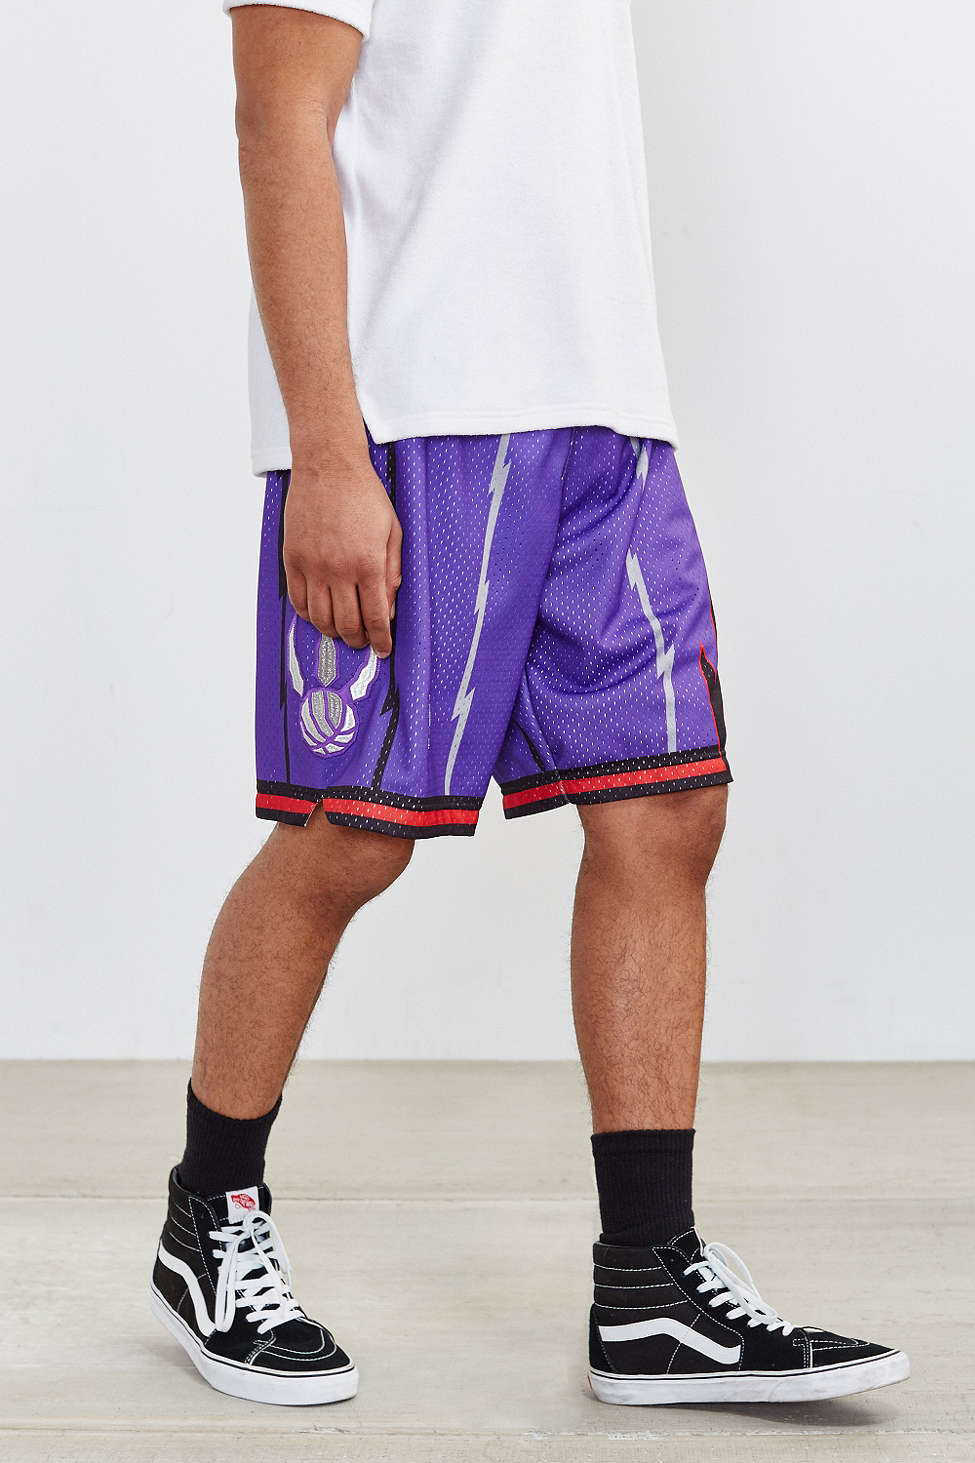 dcb1f8ae58aa4 Mitchell & Ness Toronto Raptors Authentic Basketball Short in Purple ...